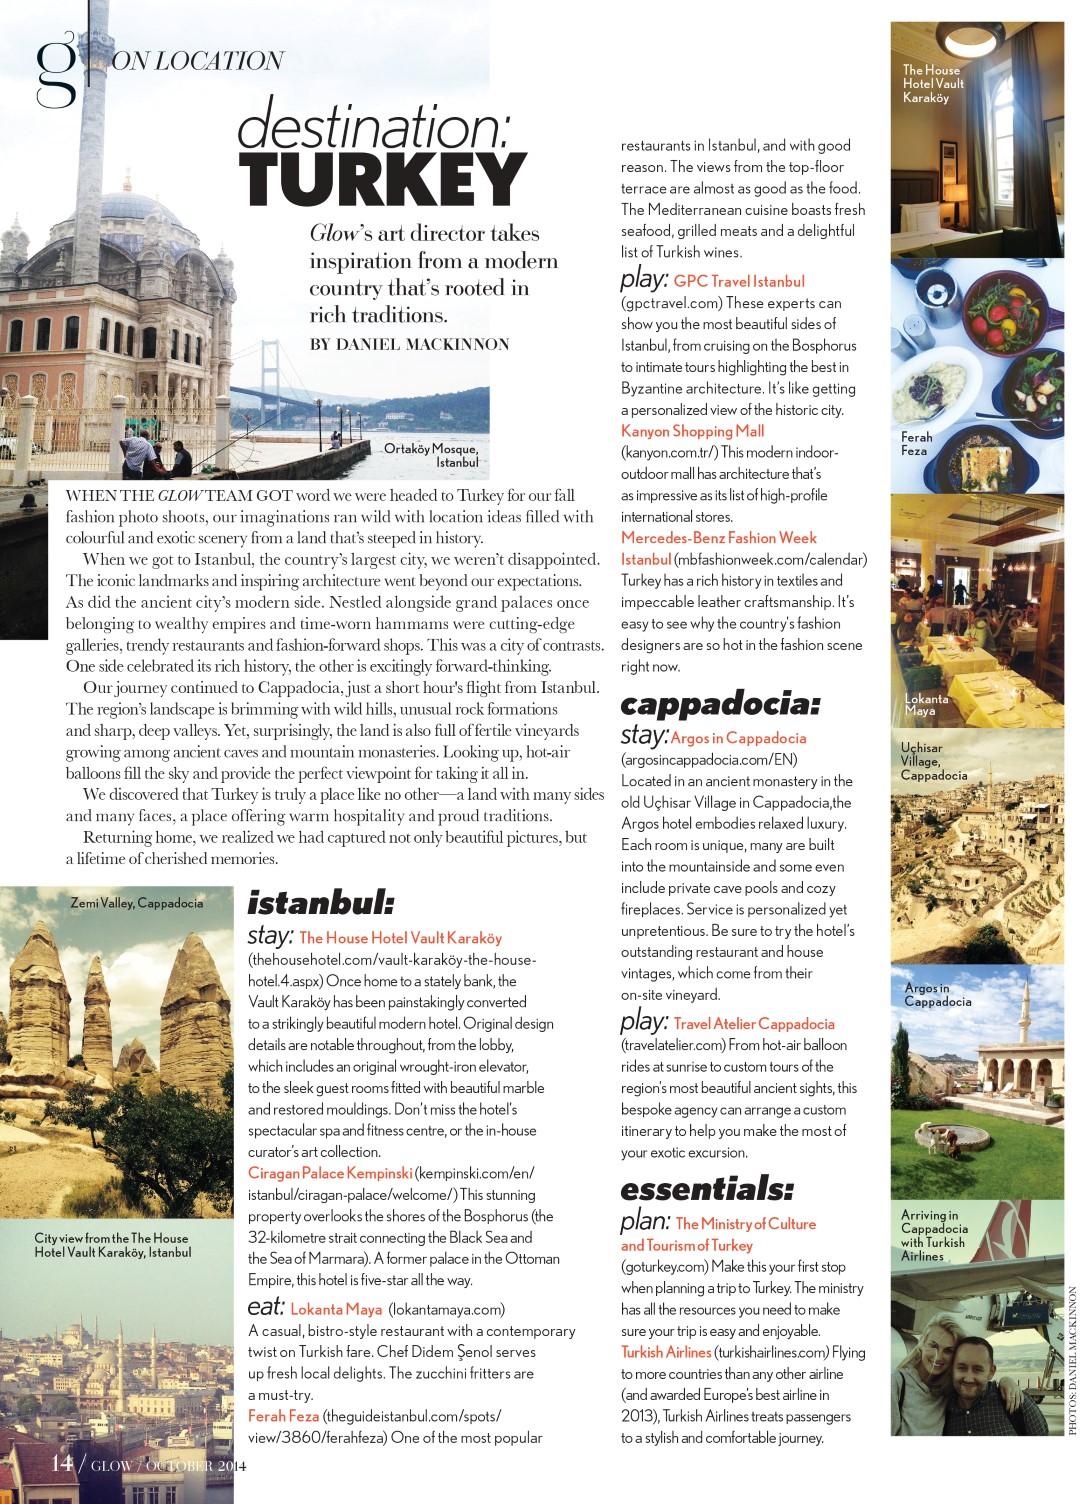 glow-magazine-destination-turkey